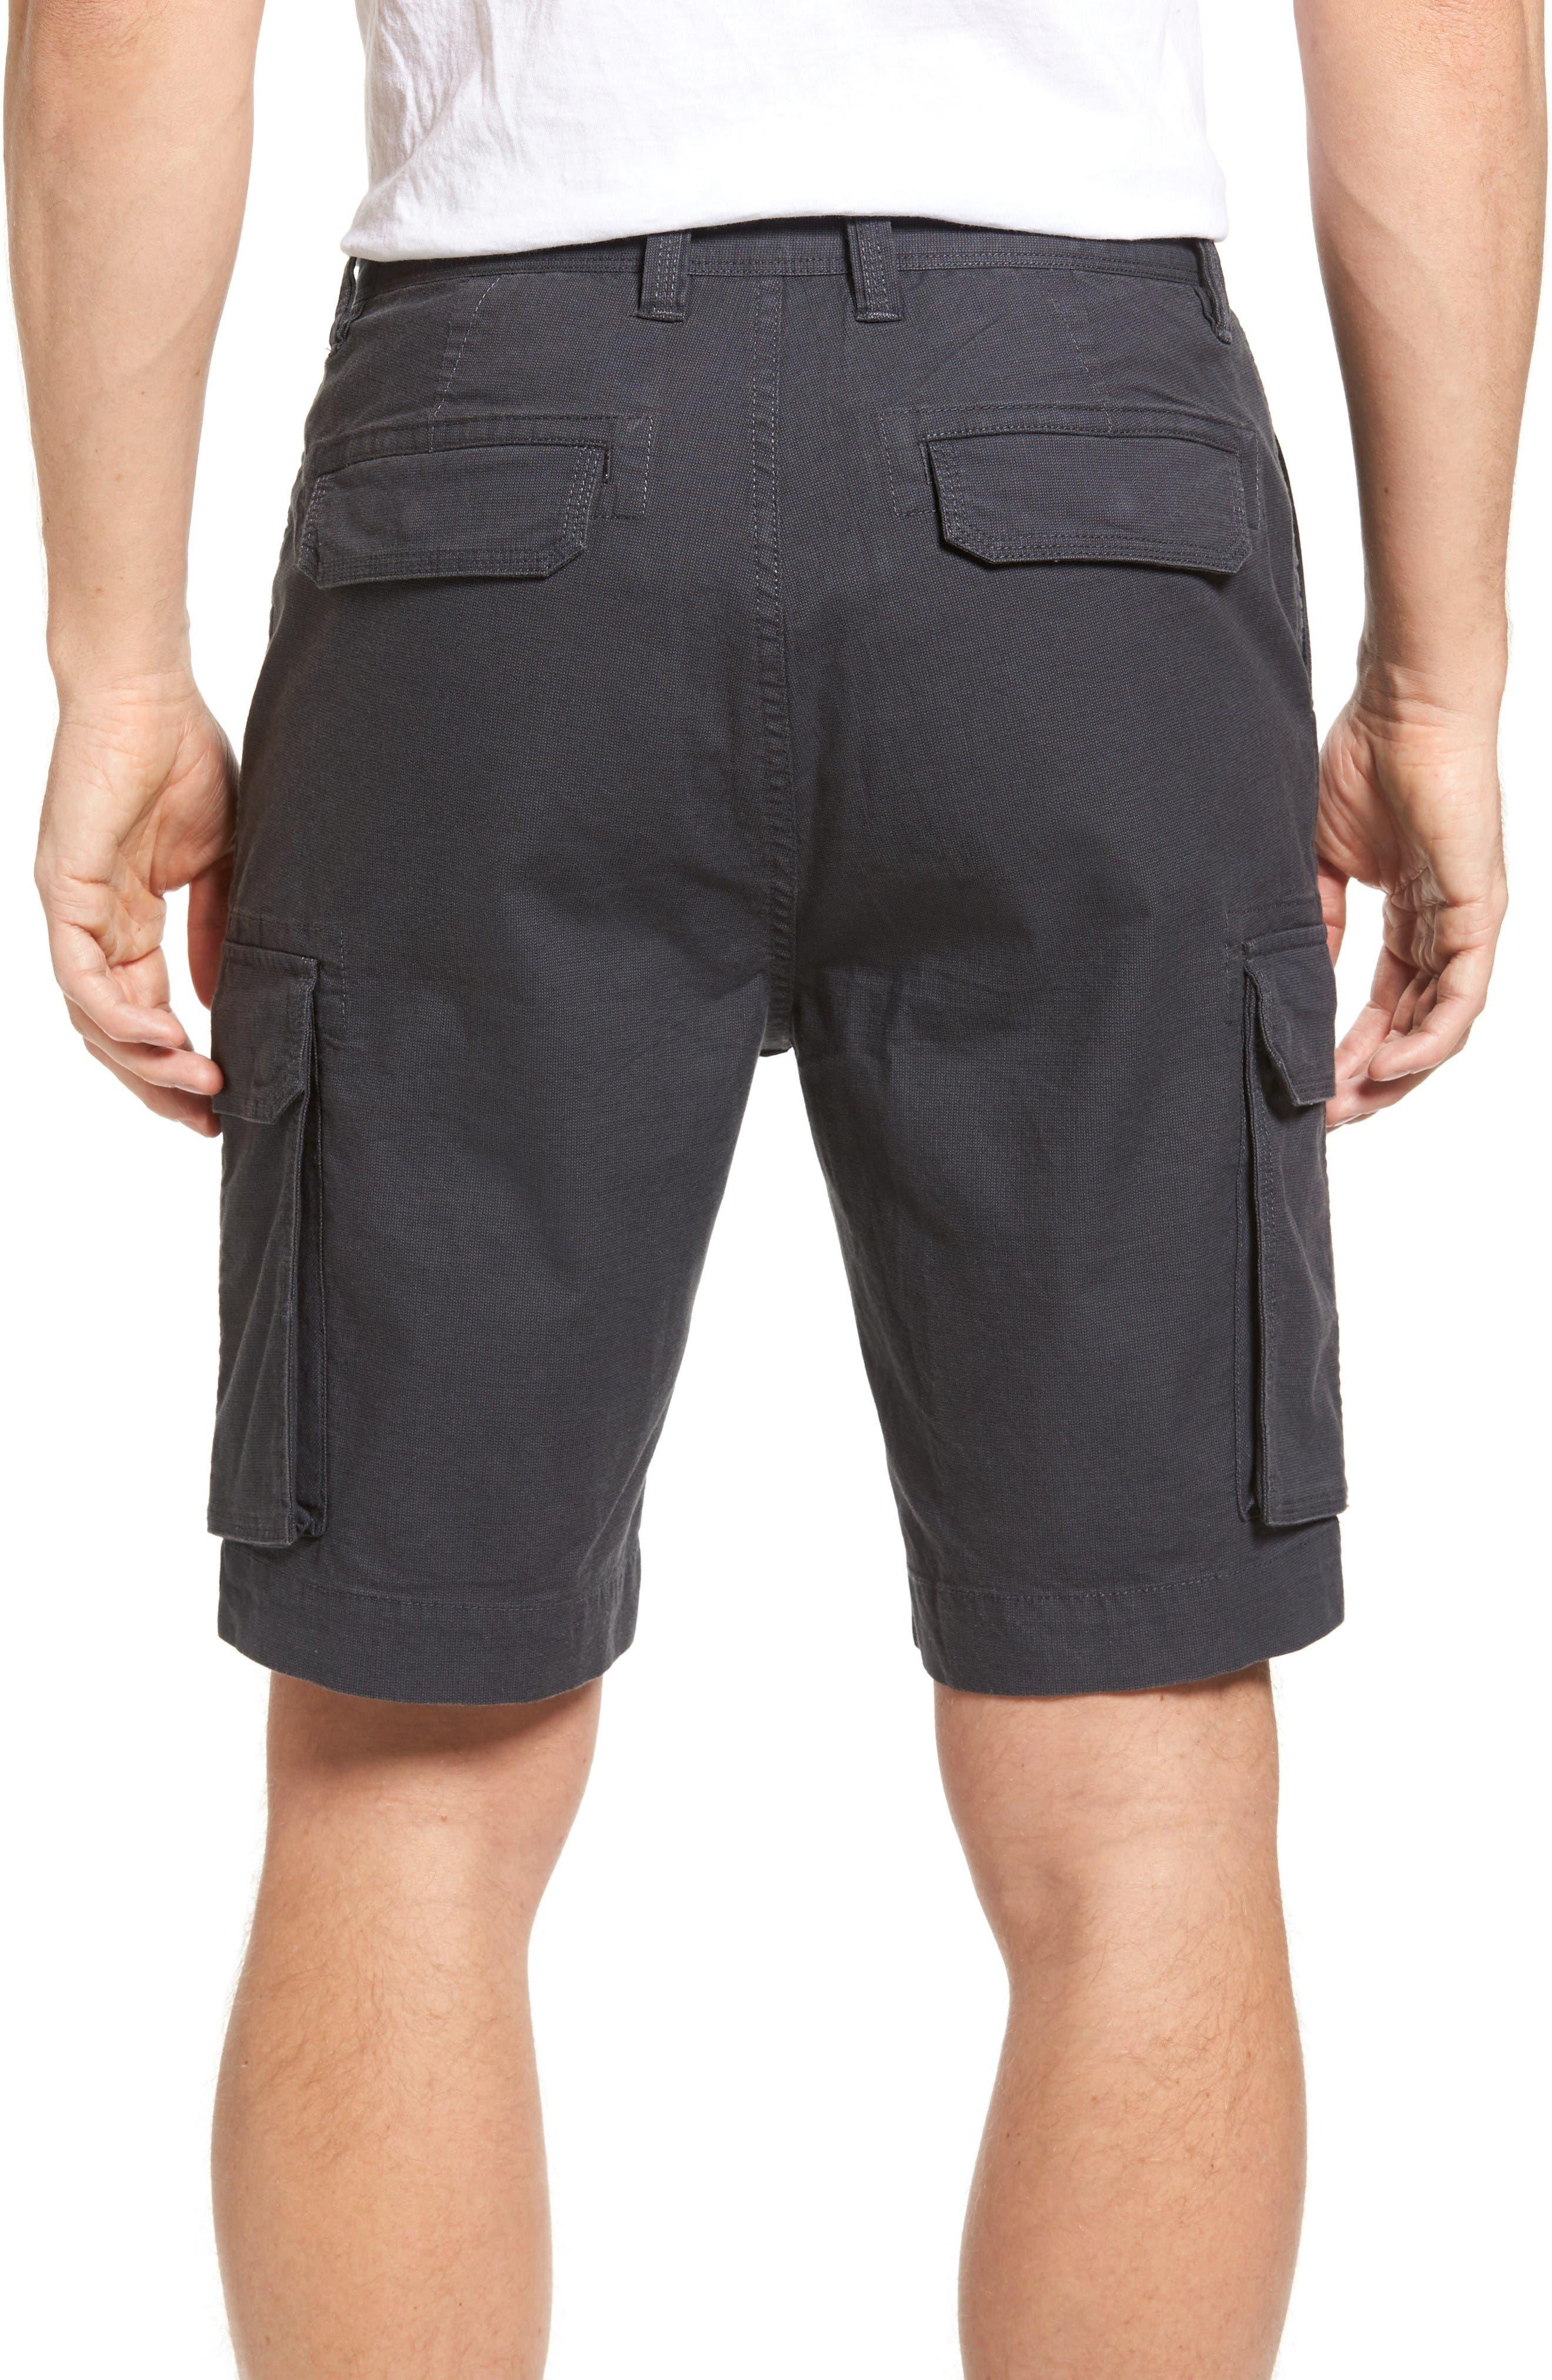 Ludstone Cargo Shorts,                             Alternate thumbnail 2, color,                             Blue Graphite